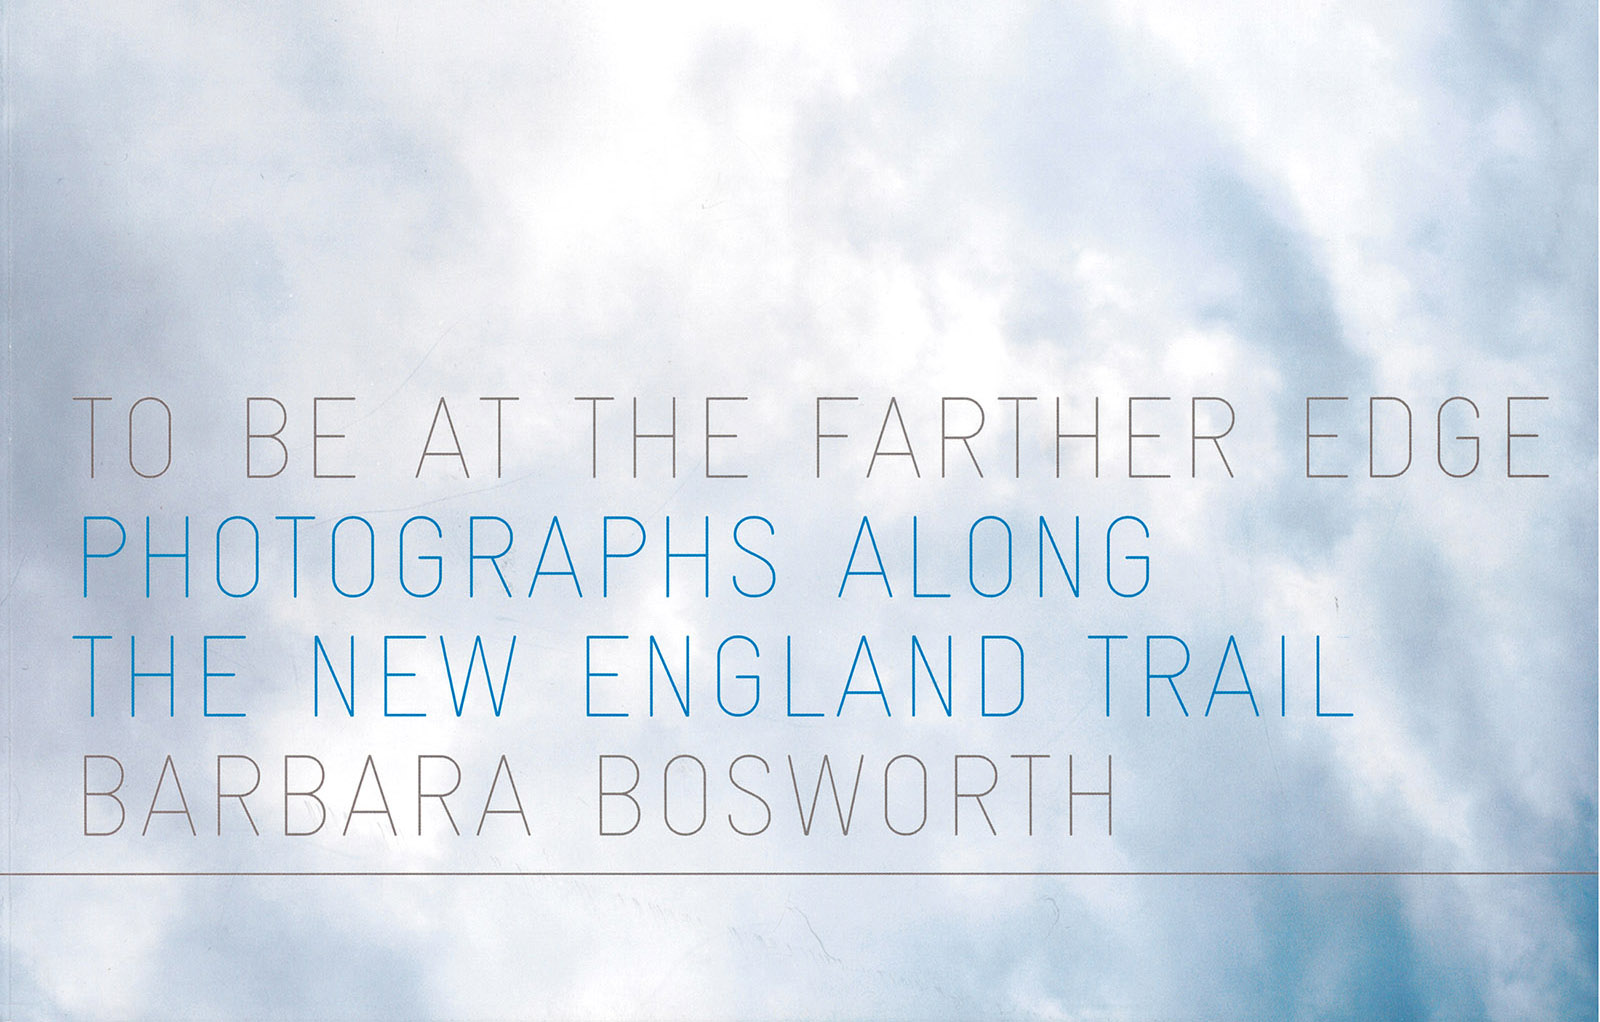 Barbara Bosworth